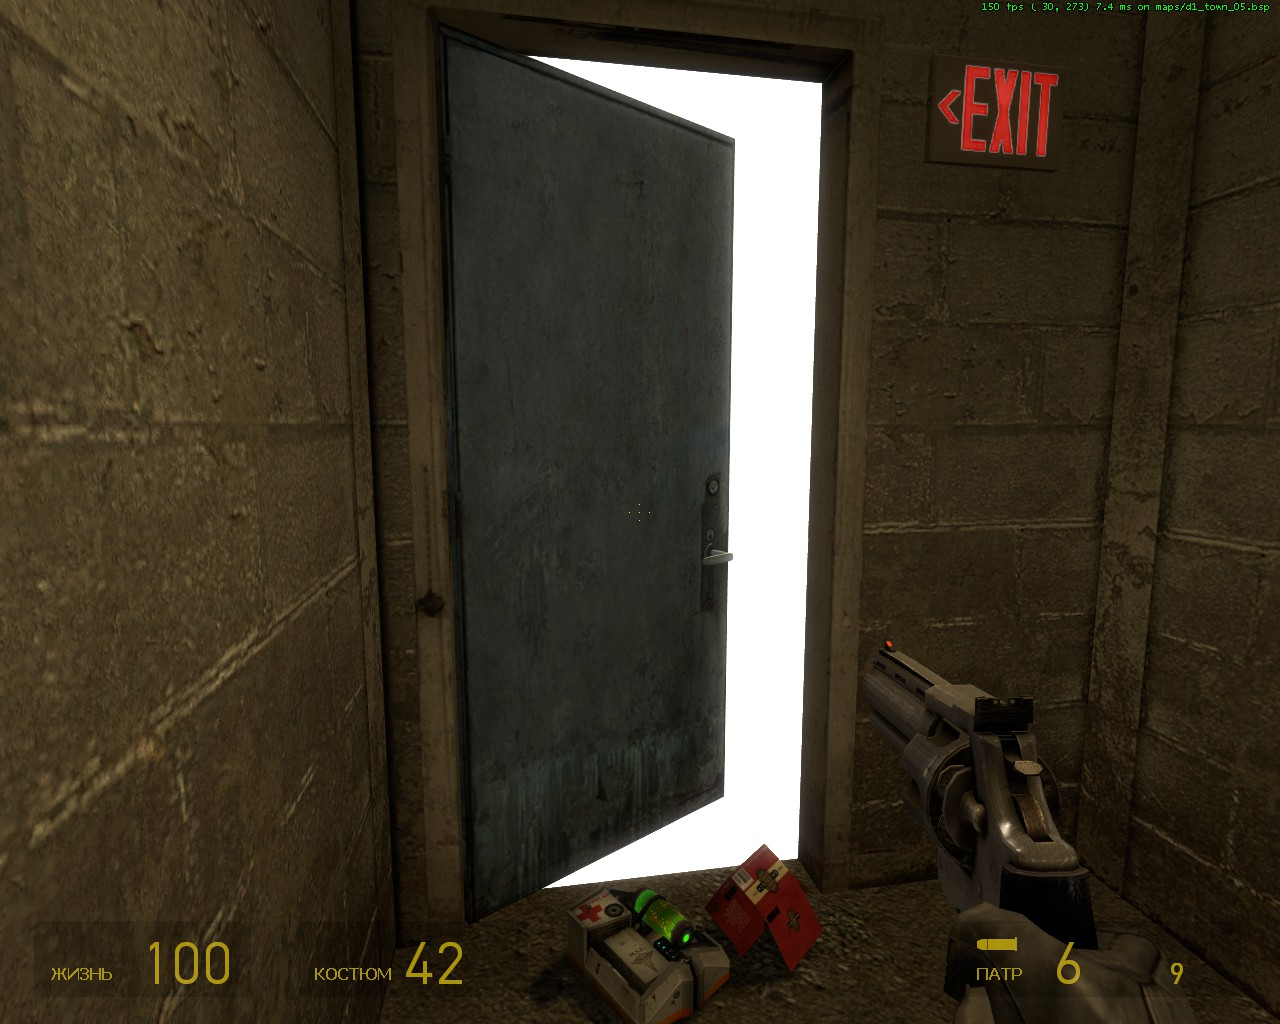 d1_town_050005.jpg - Half-Life 2